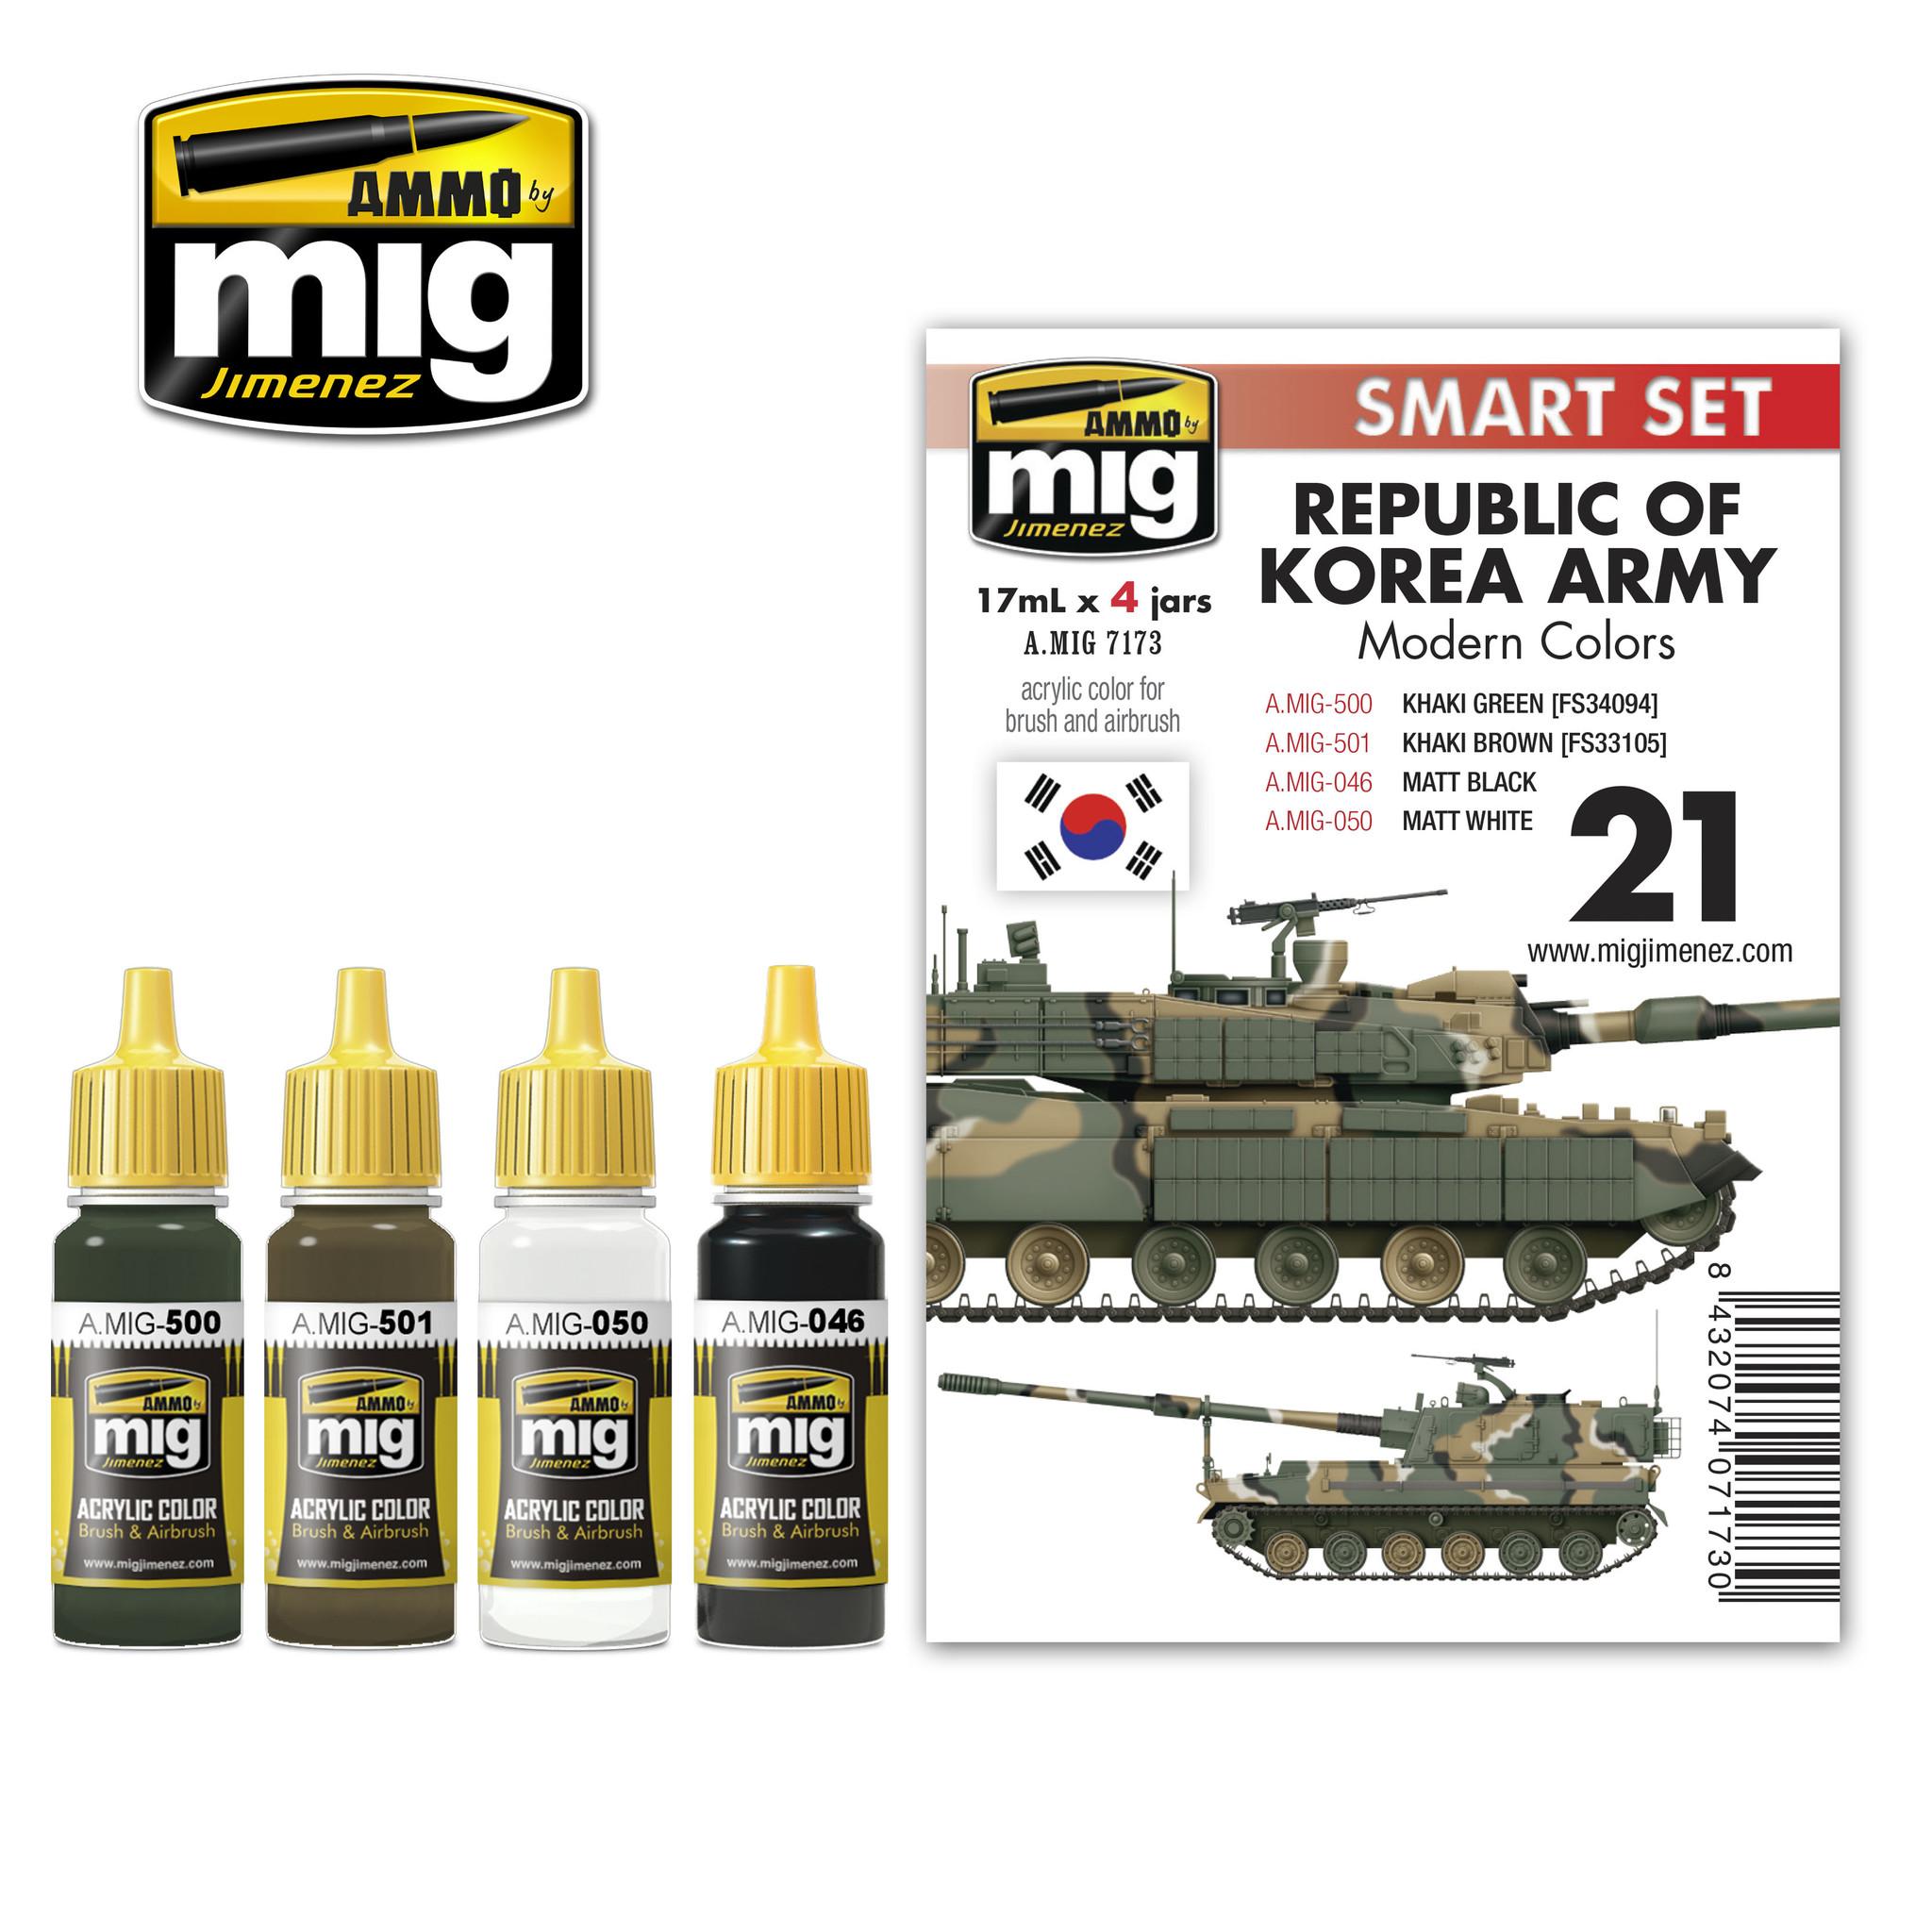 Ammo by Mig Jimenez Republic Of Korea Army Modern Colors - A.MIG-7173